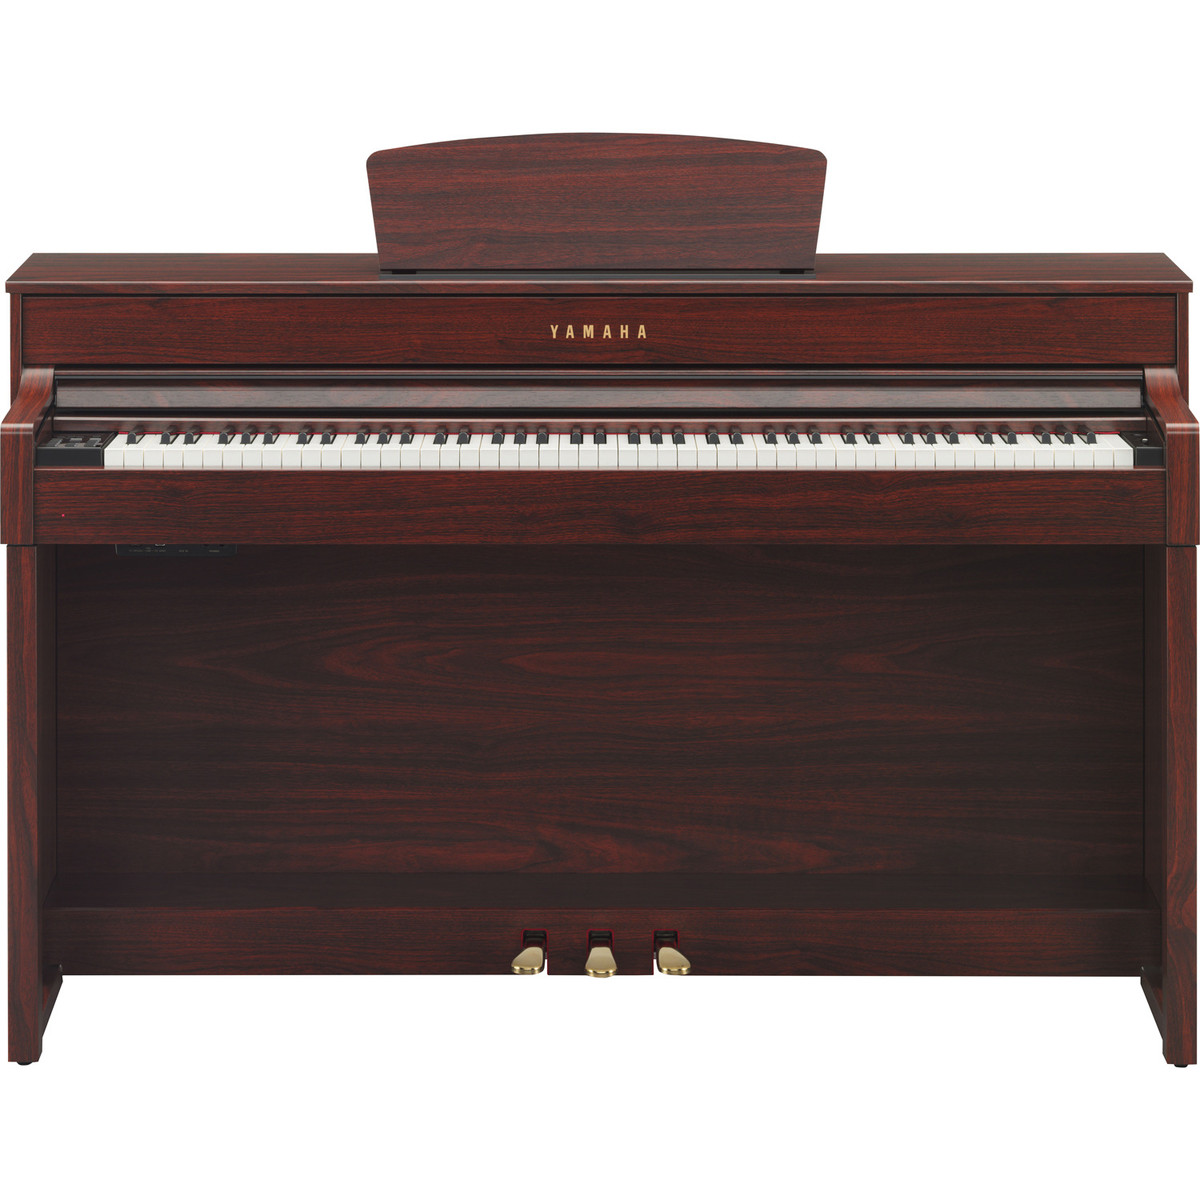 yamaha clavinova clp535 digital piano mahogany at. Black Bedroom Furniture Sets. Home Design Ideas